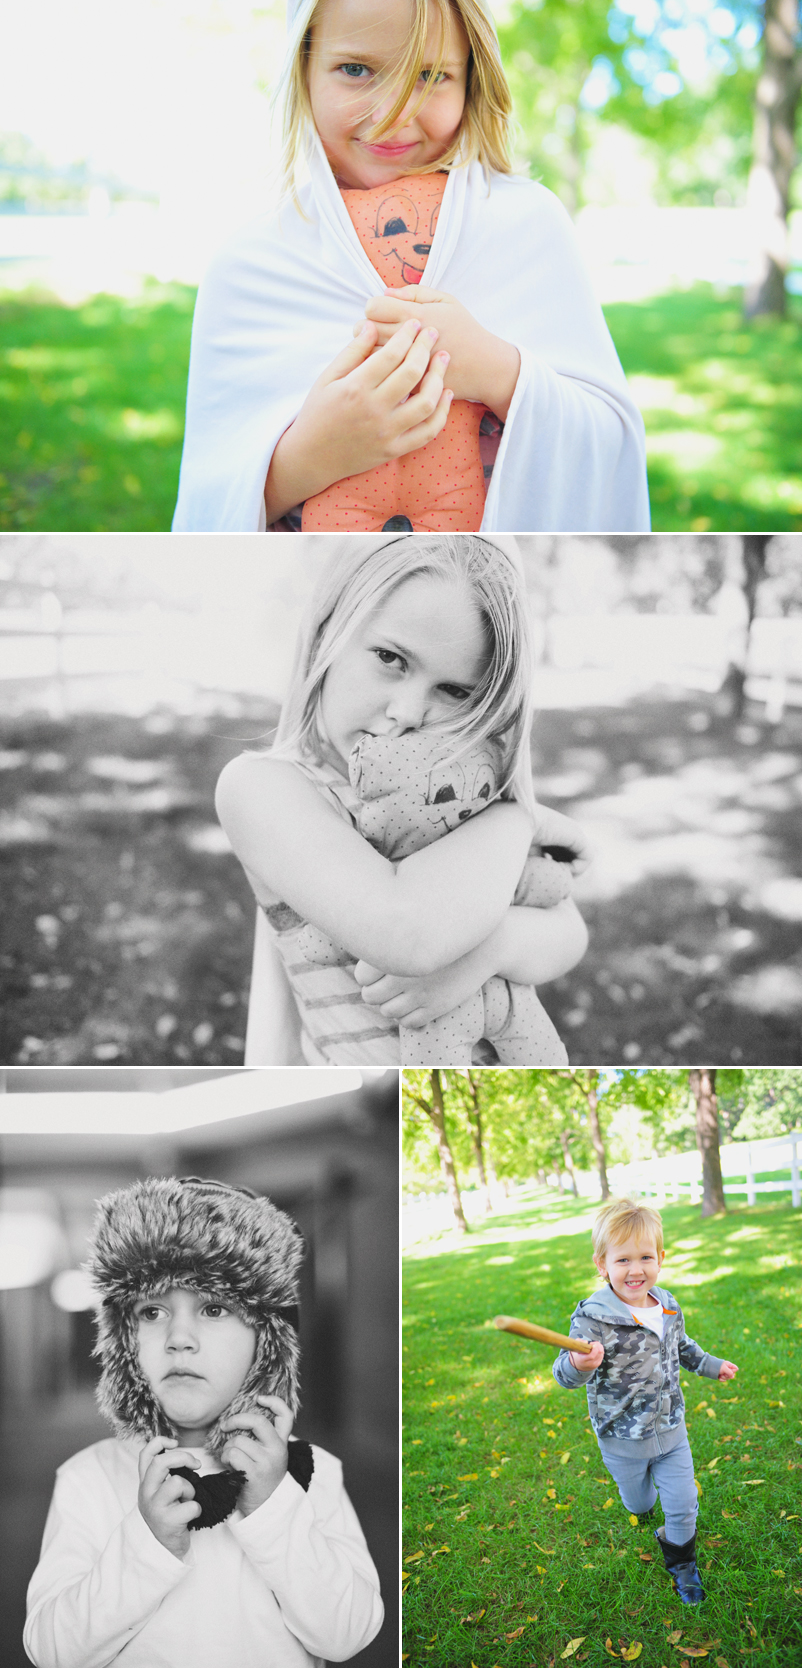 aurora family photographer, batavia family photographer, chicagoland family photography, modern family photography illinois, aurora illinois family photography, batavia family photography, chicagoland family photographer, wheaton il family photography